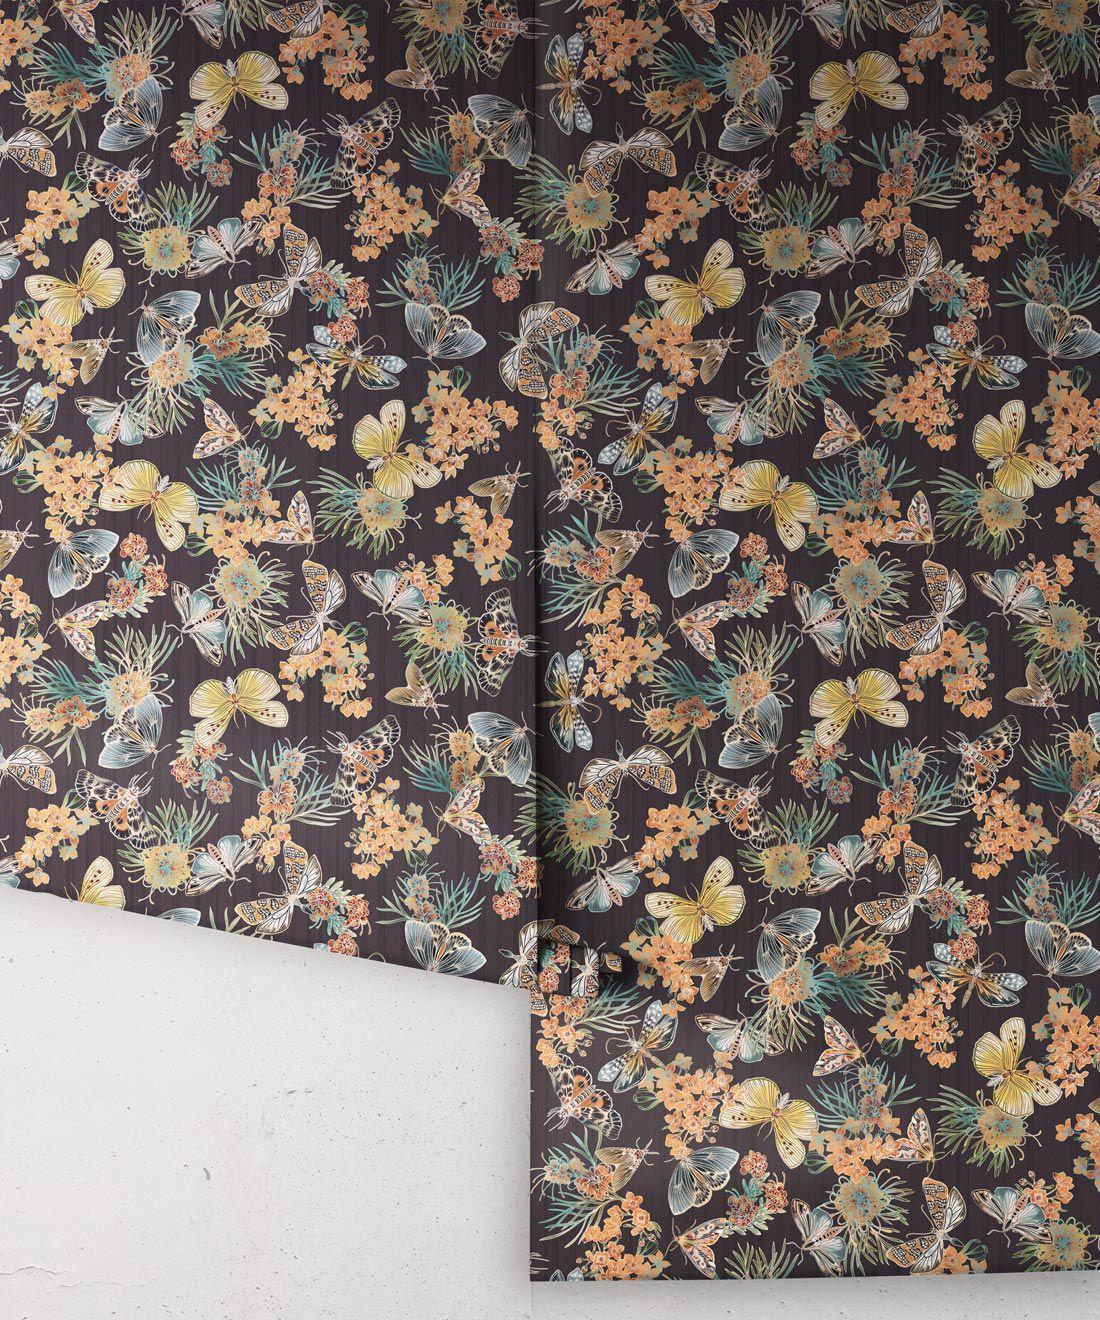 Moth Wallpaper • Eloise Short • Vintage Floral Wallpaper •Granny Chic Wallpaper • Grandmillennial Style Wallpaper •Night •Rolls